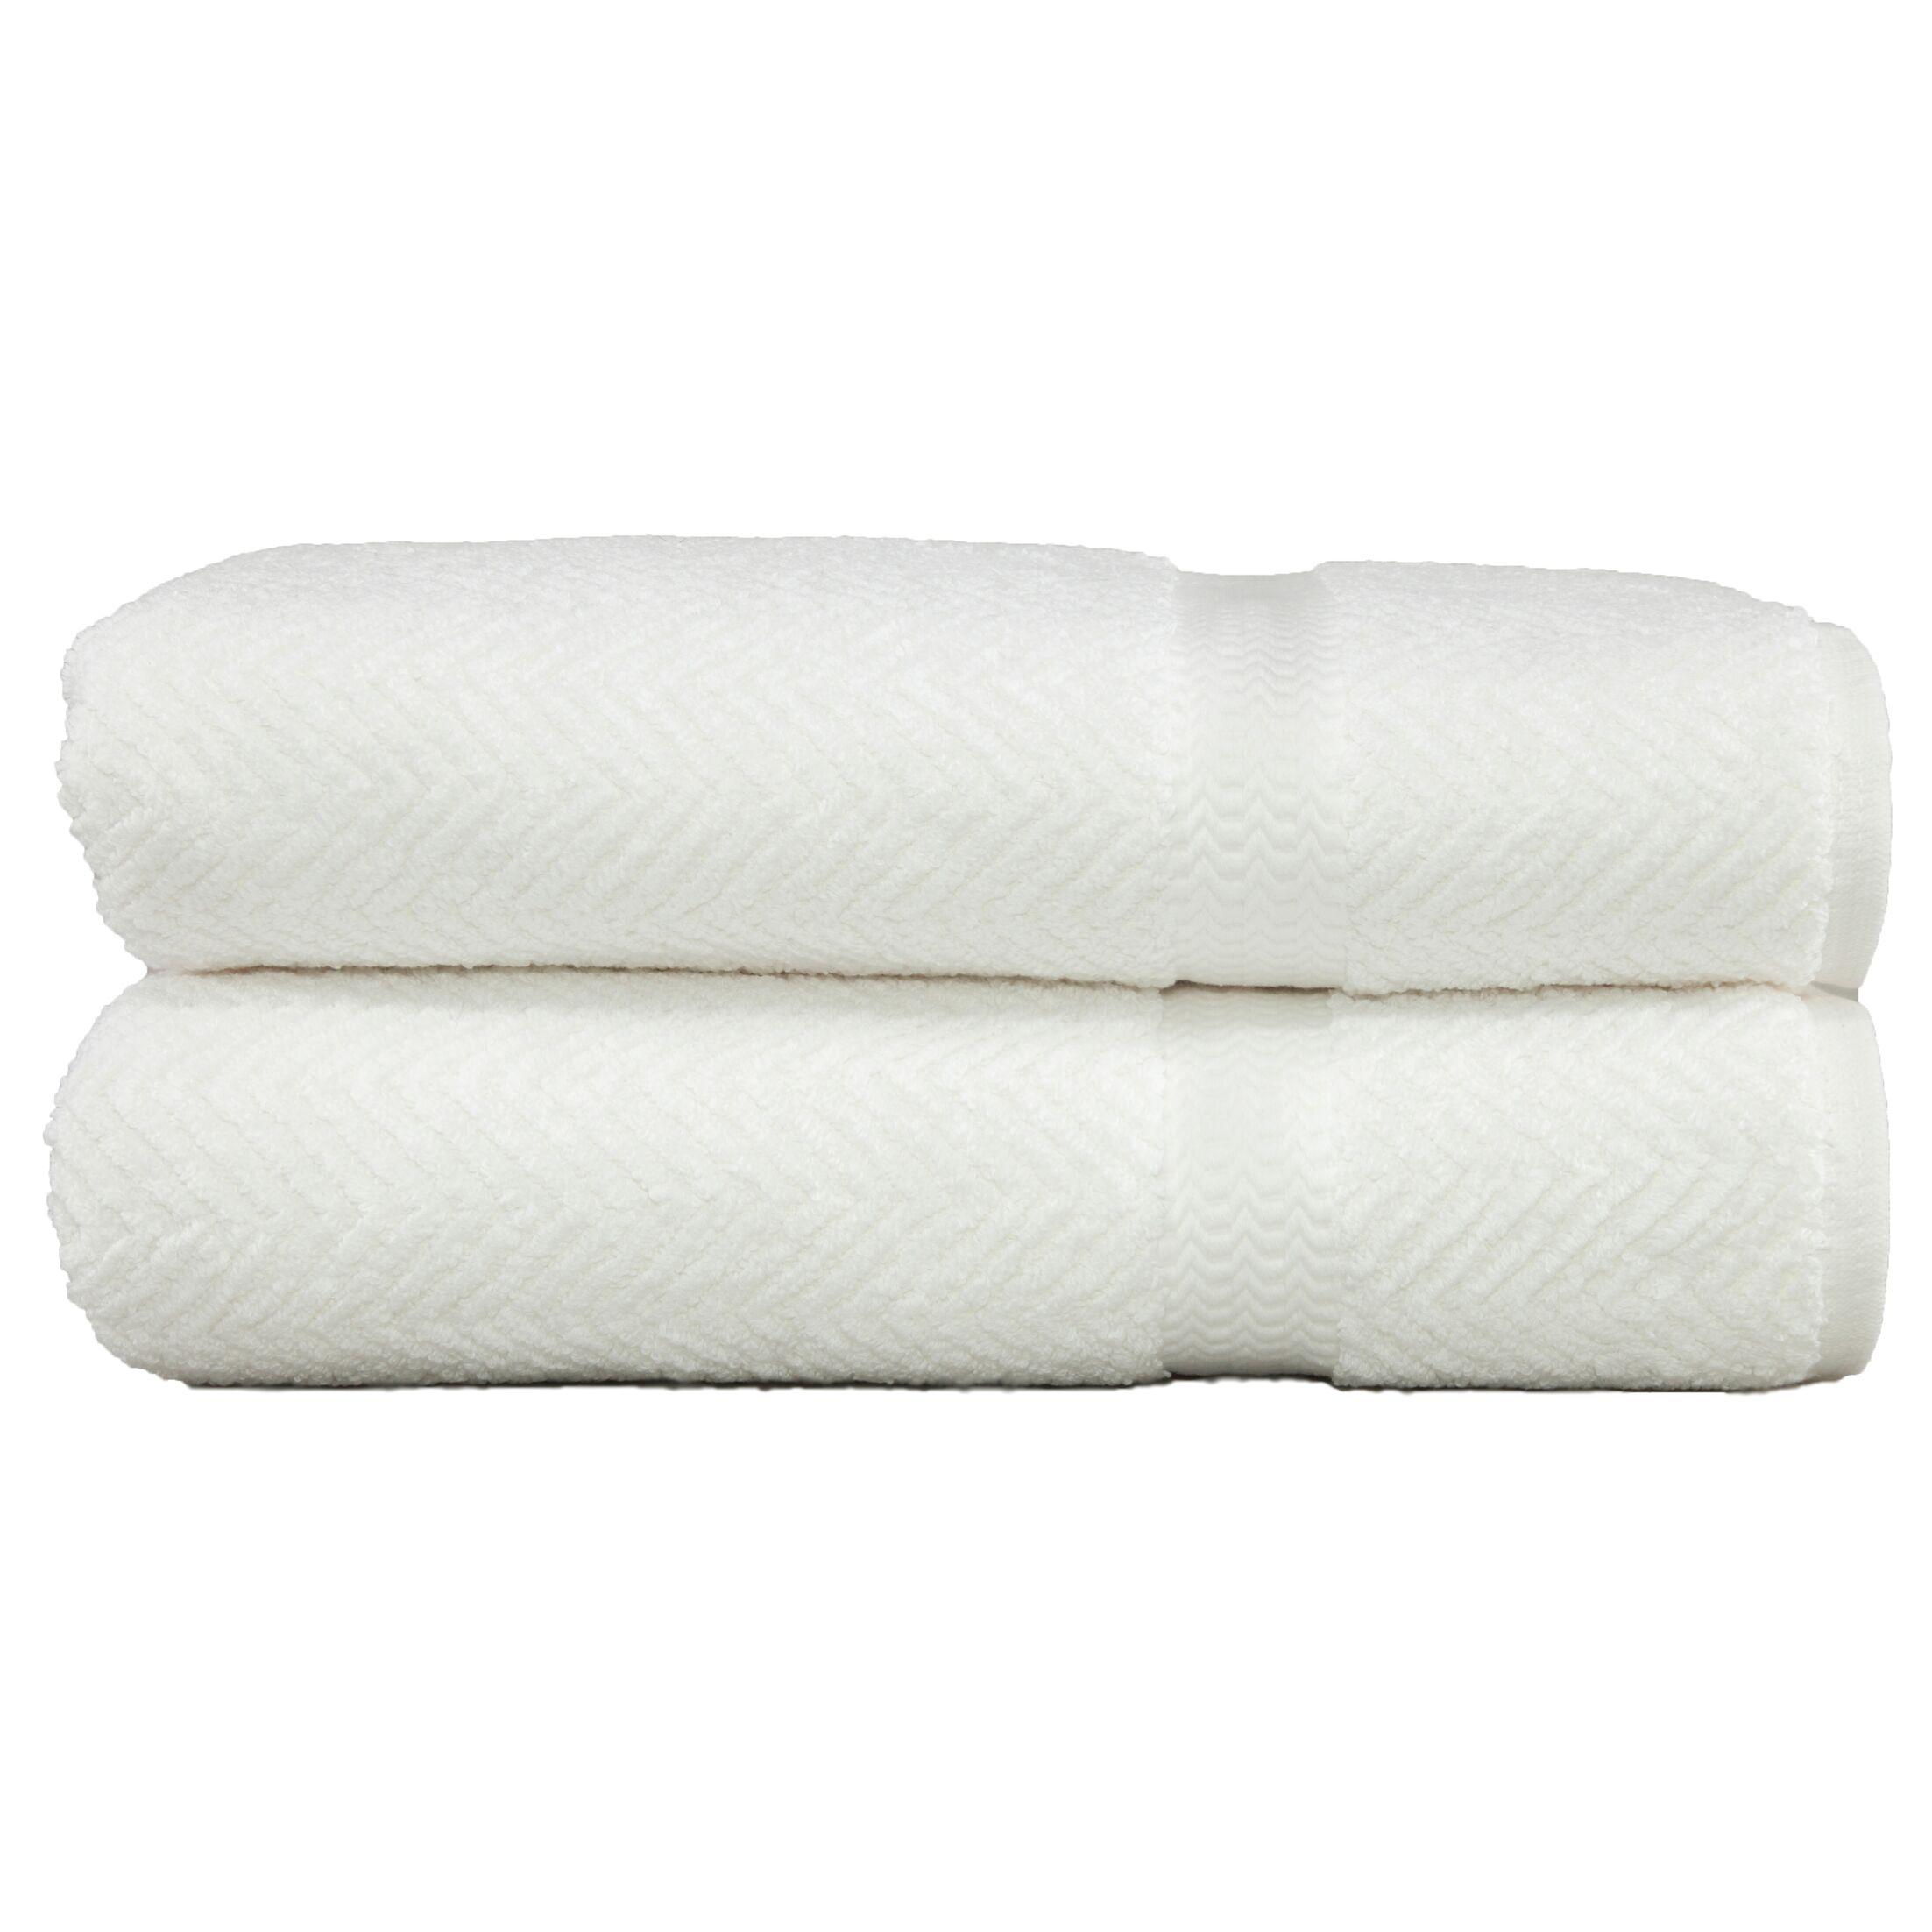 Spilsby Bath Sheet Color: White